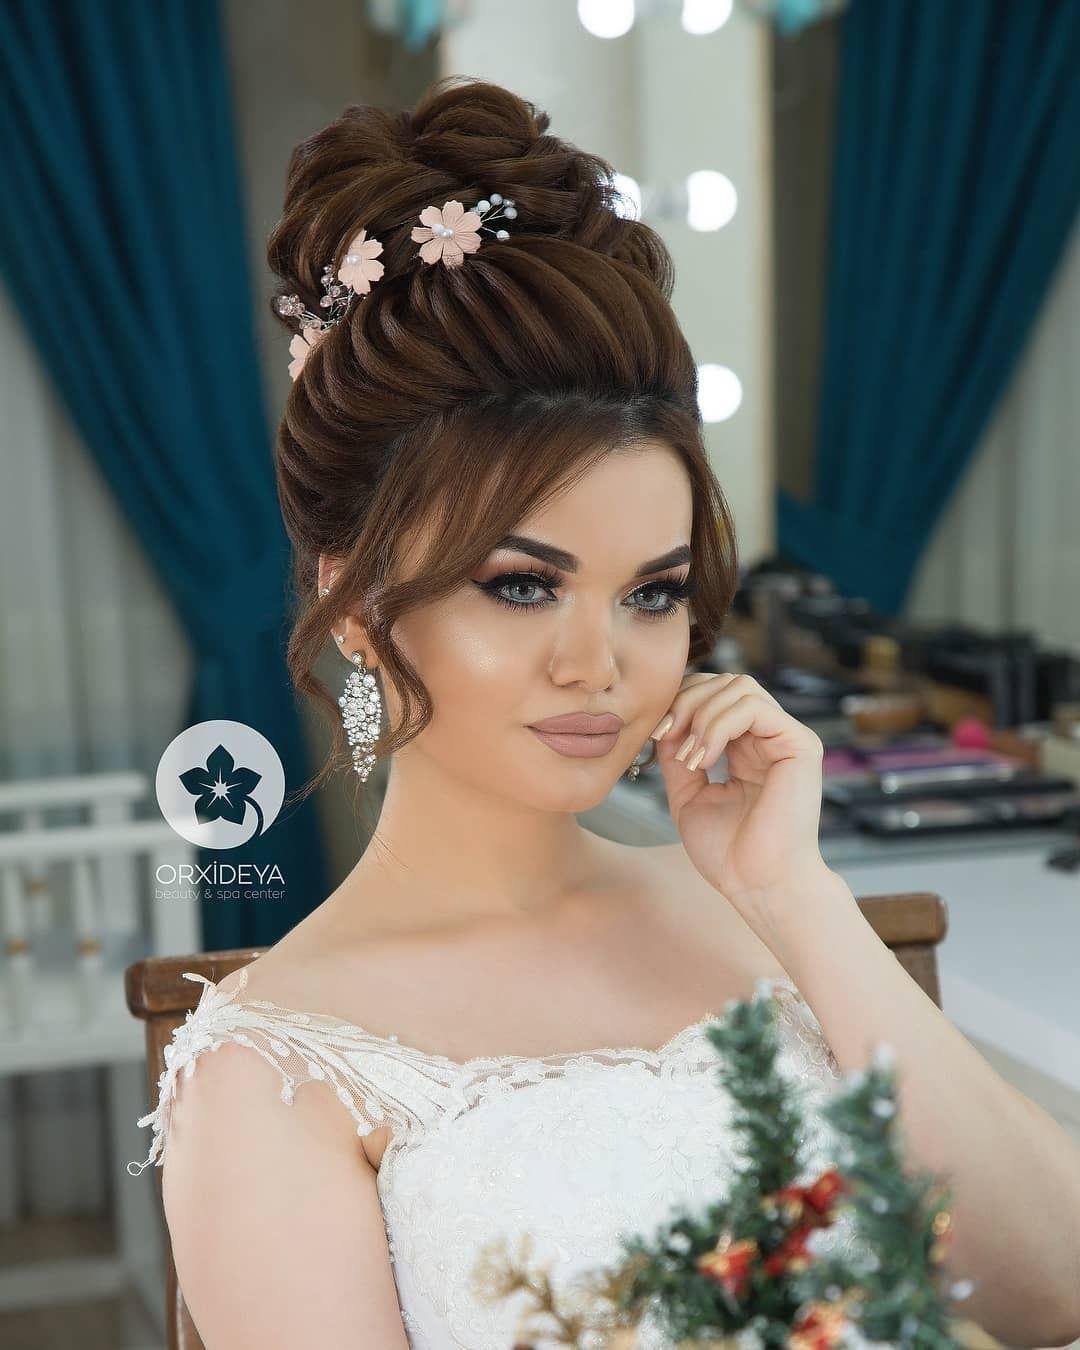 Anush Beknazaryan Adli Kullanicinin Make Up Panosundaki Pin Uzun Sac Dugun Saci Gelin Sac Modelleri